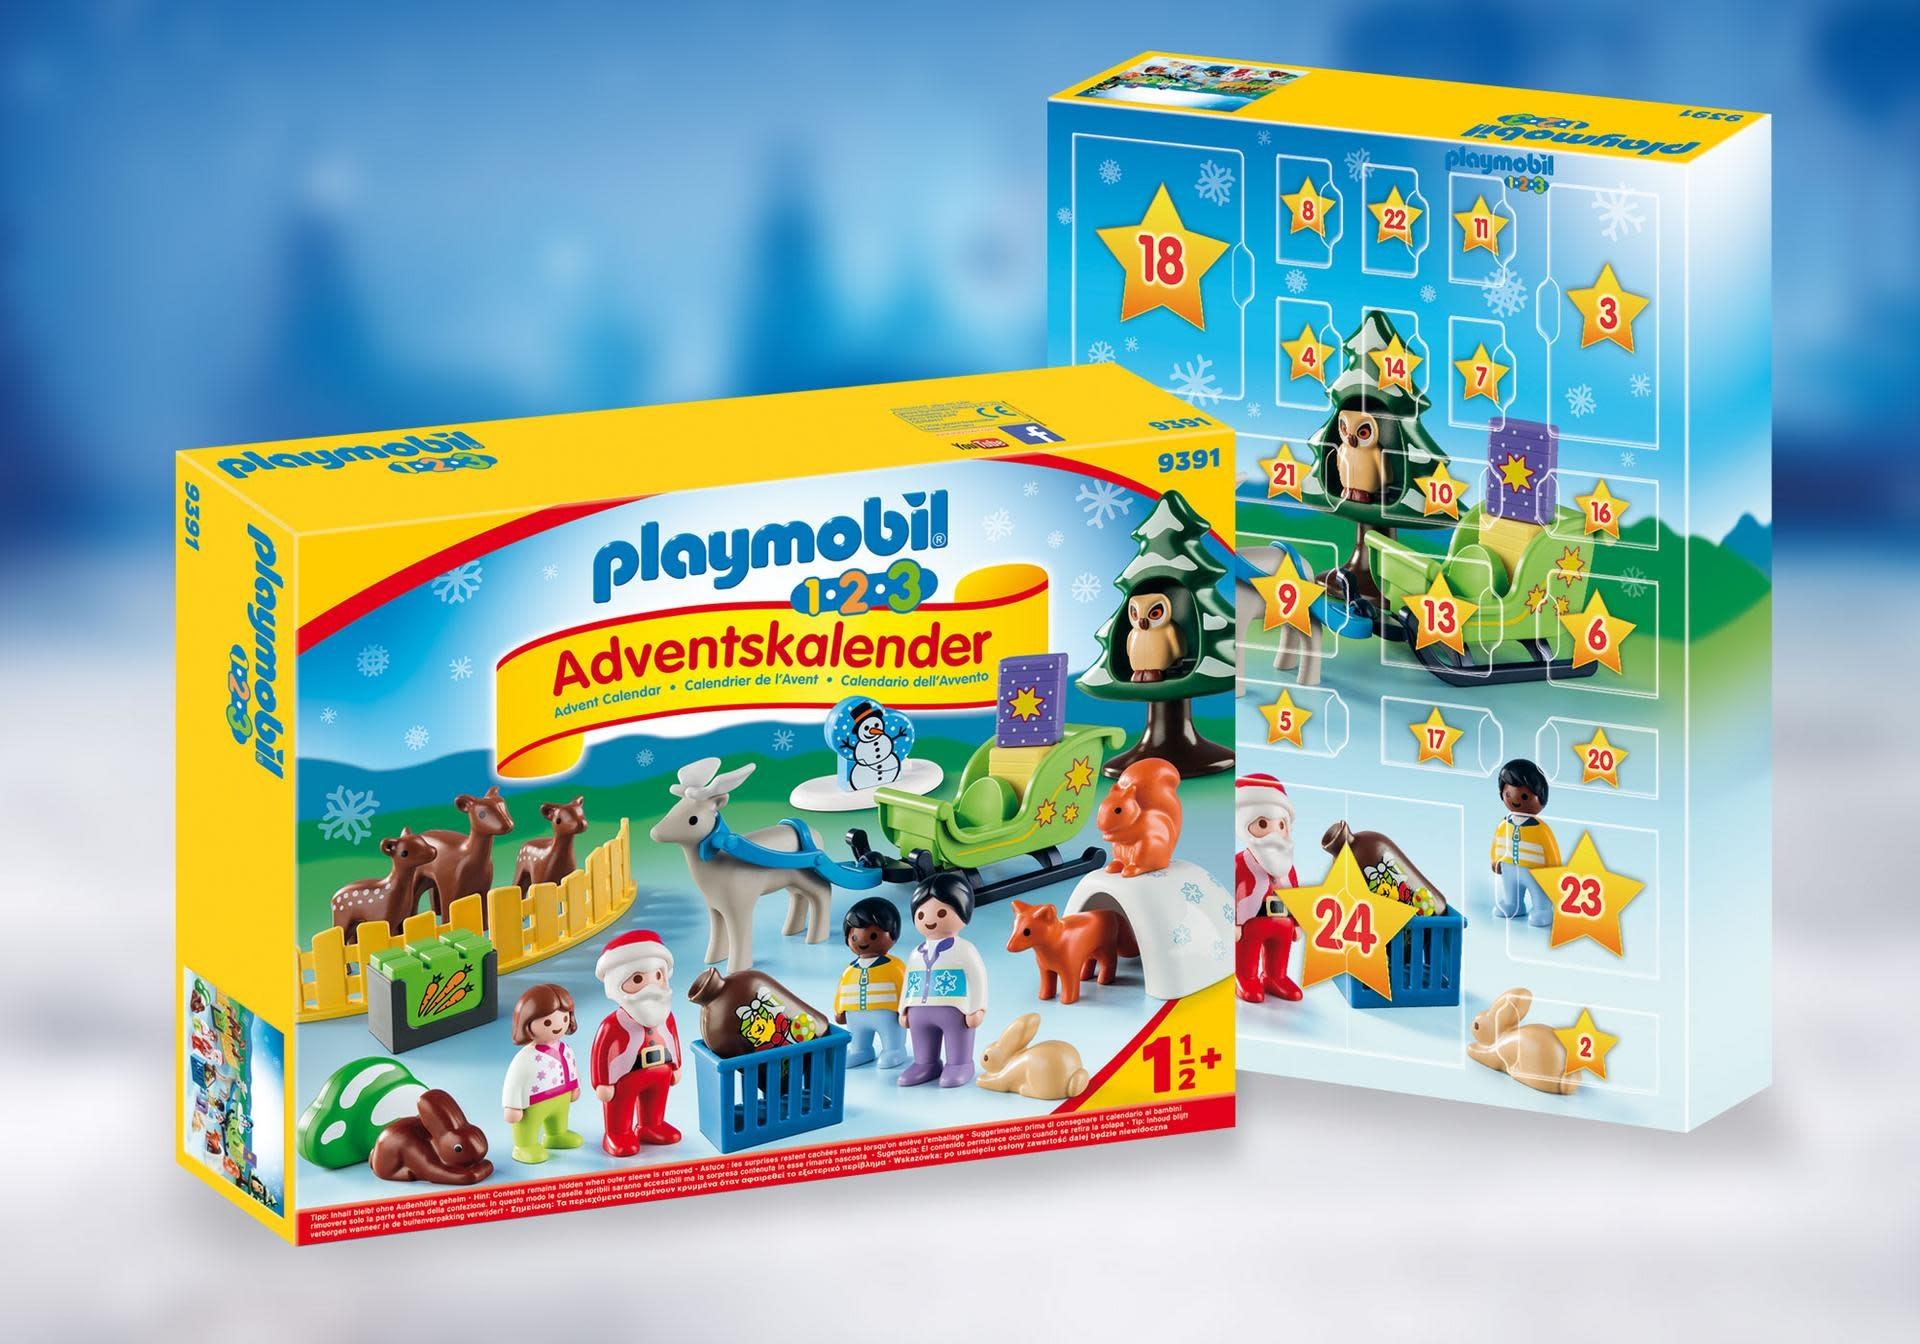 Calendario Avvento Playmobil.Playmobil Advent Calendar 2019 123 Christmas In The Forest